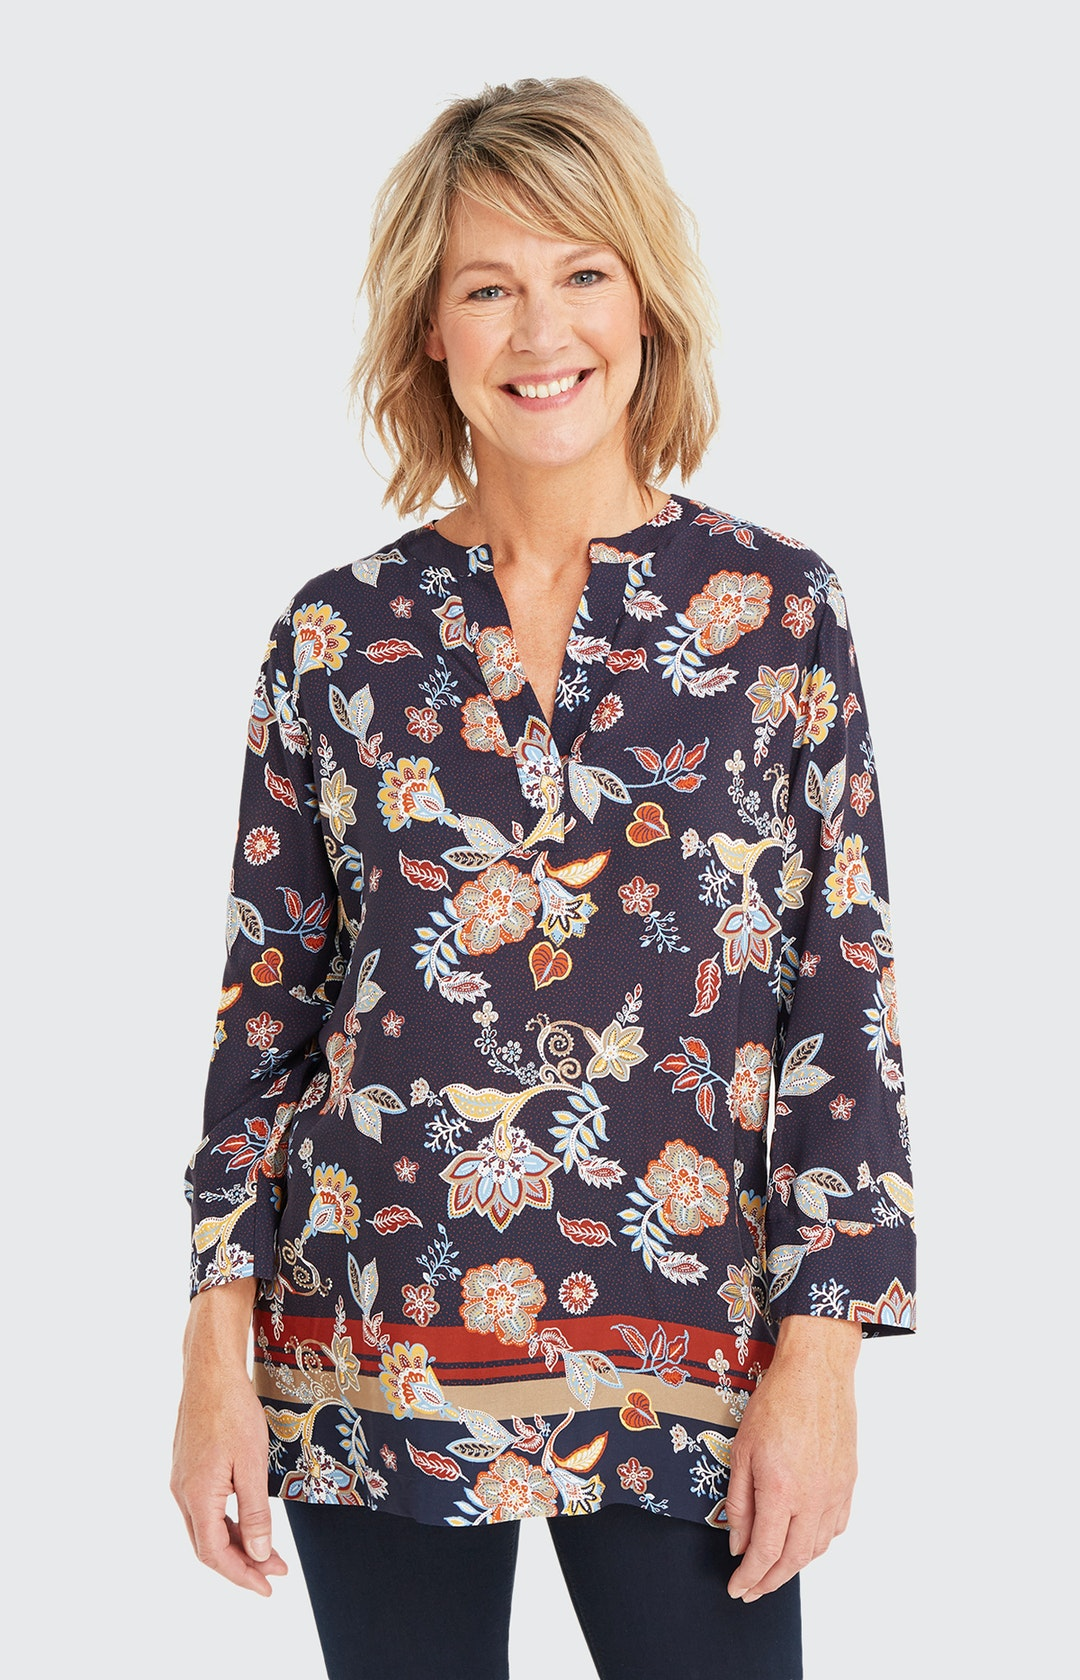 Shirtbluse mit Allover-Muster in Blau